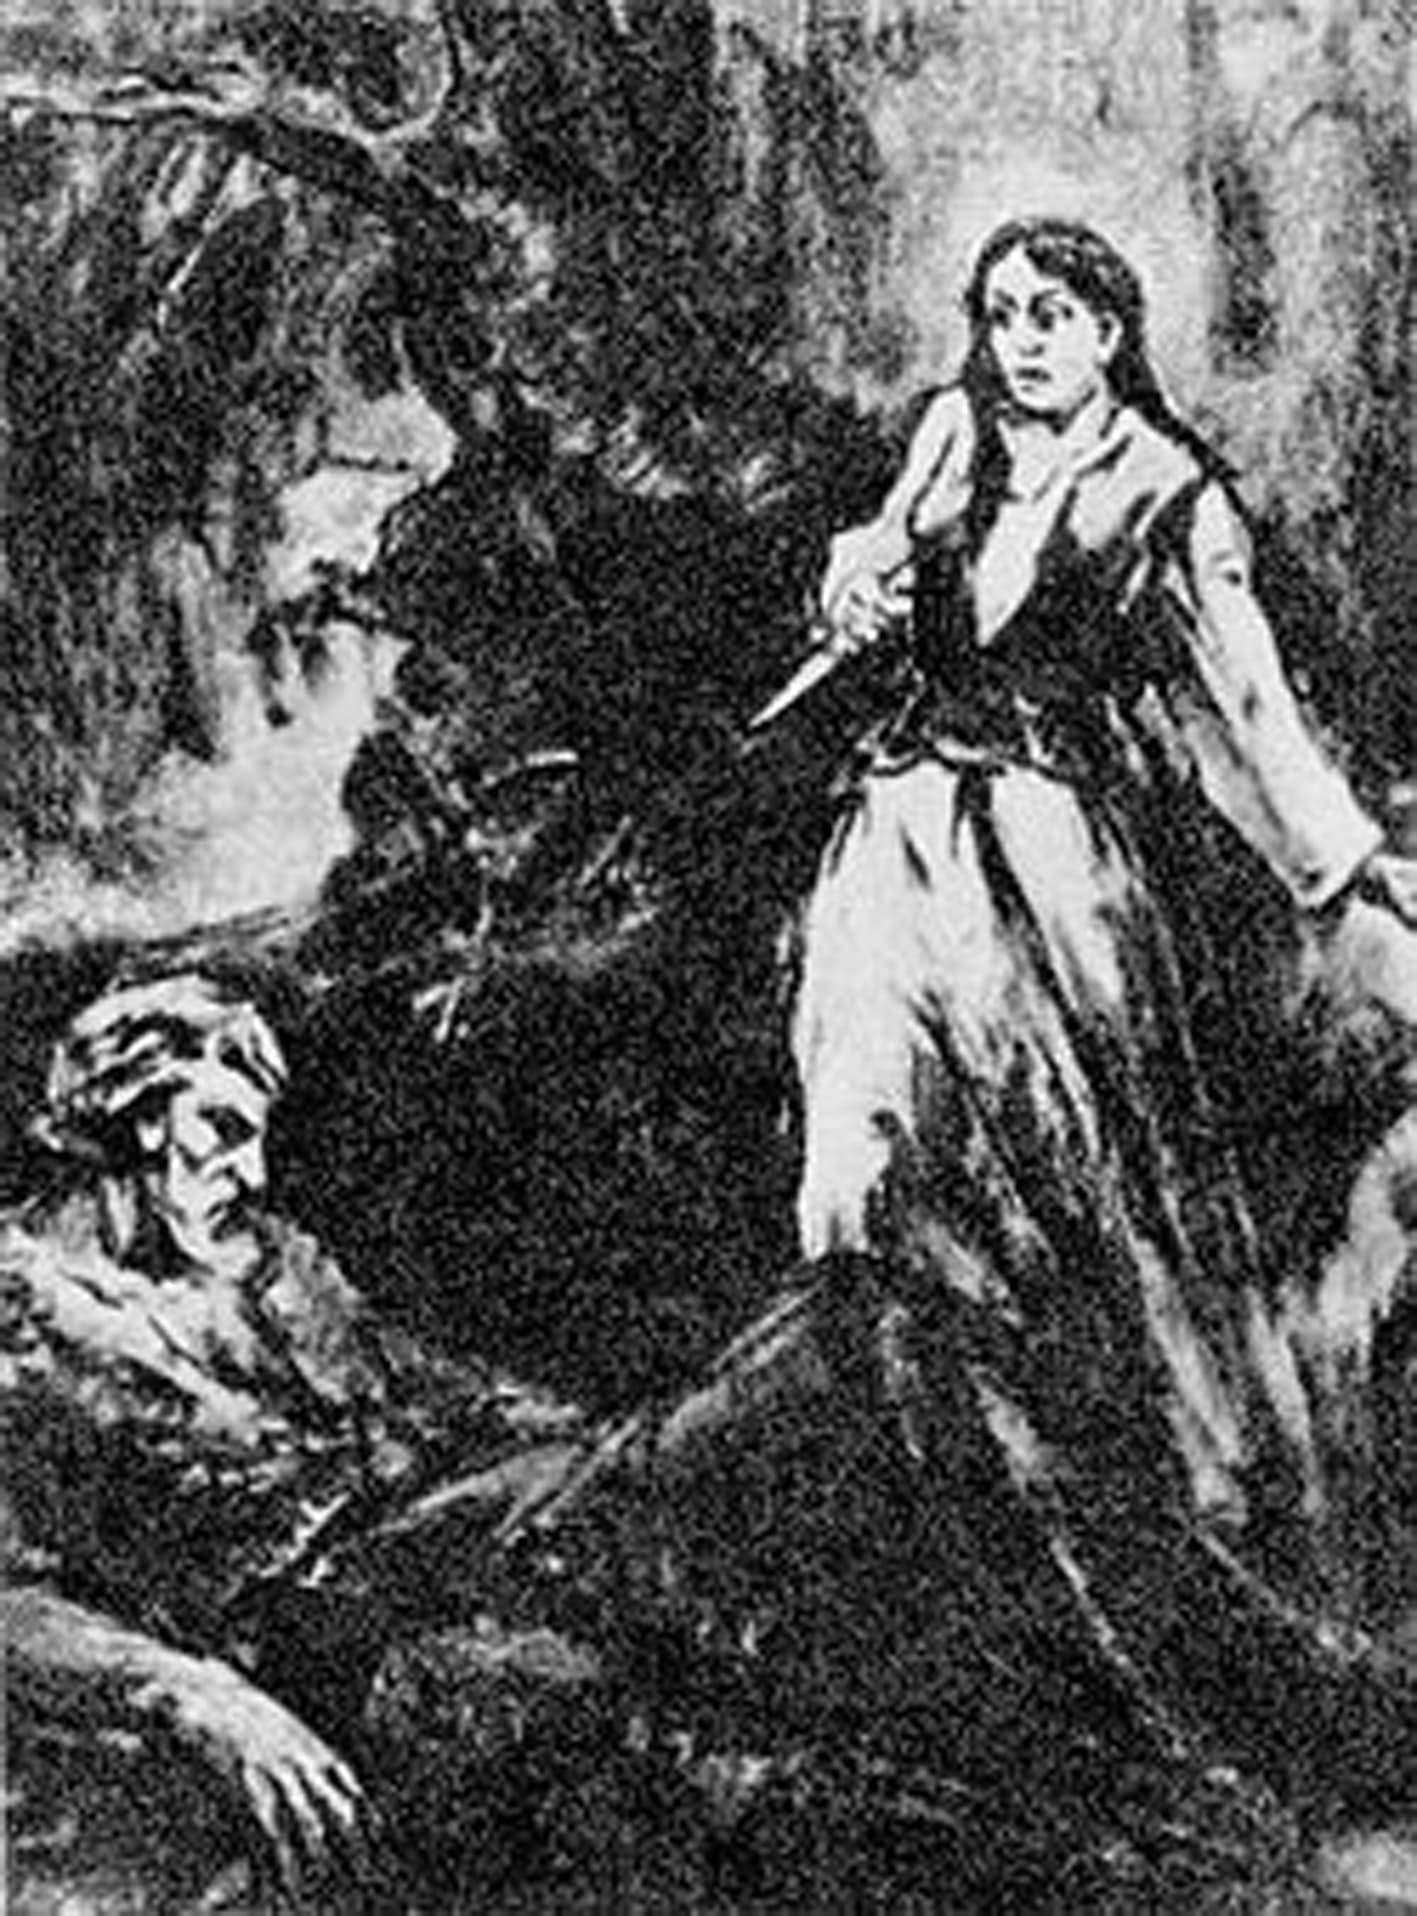 Легенда о Машеке связана с основанием Могилева